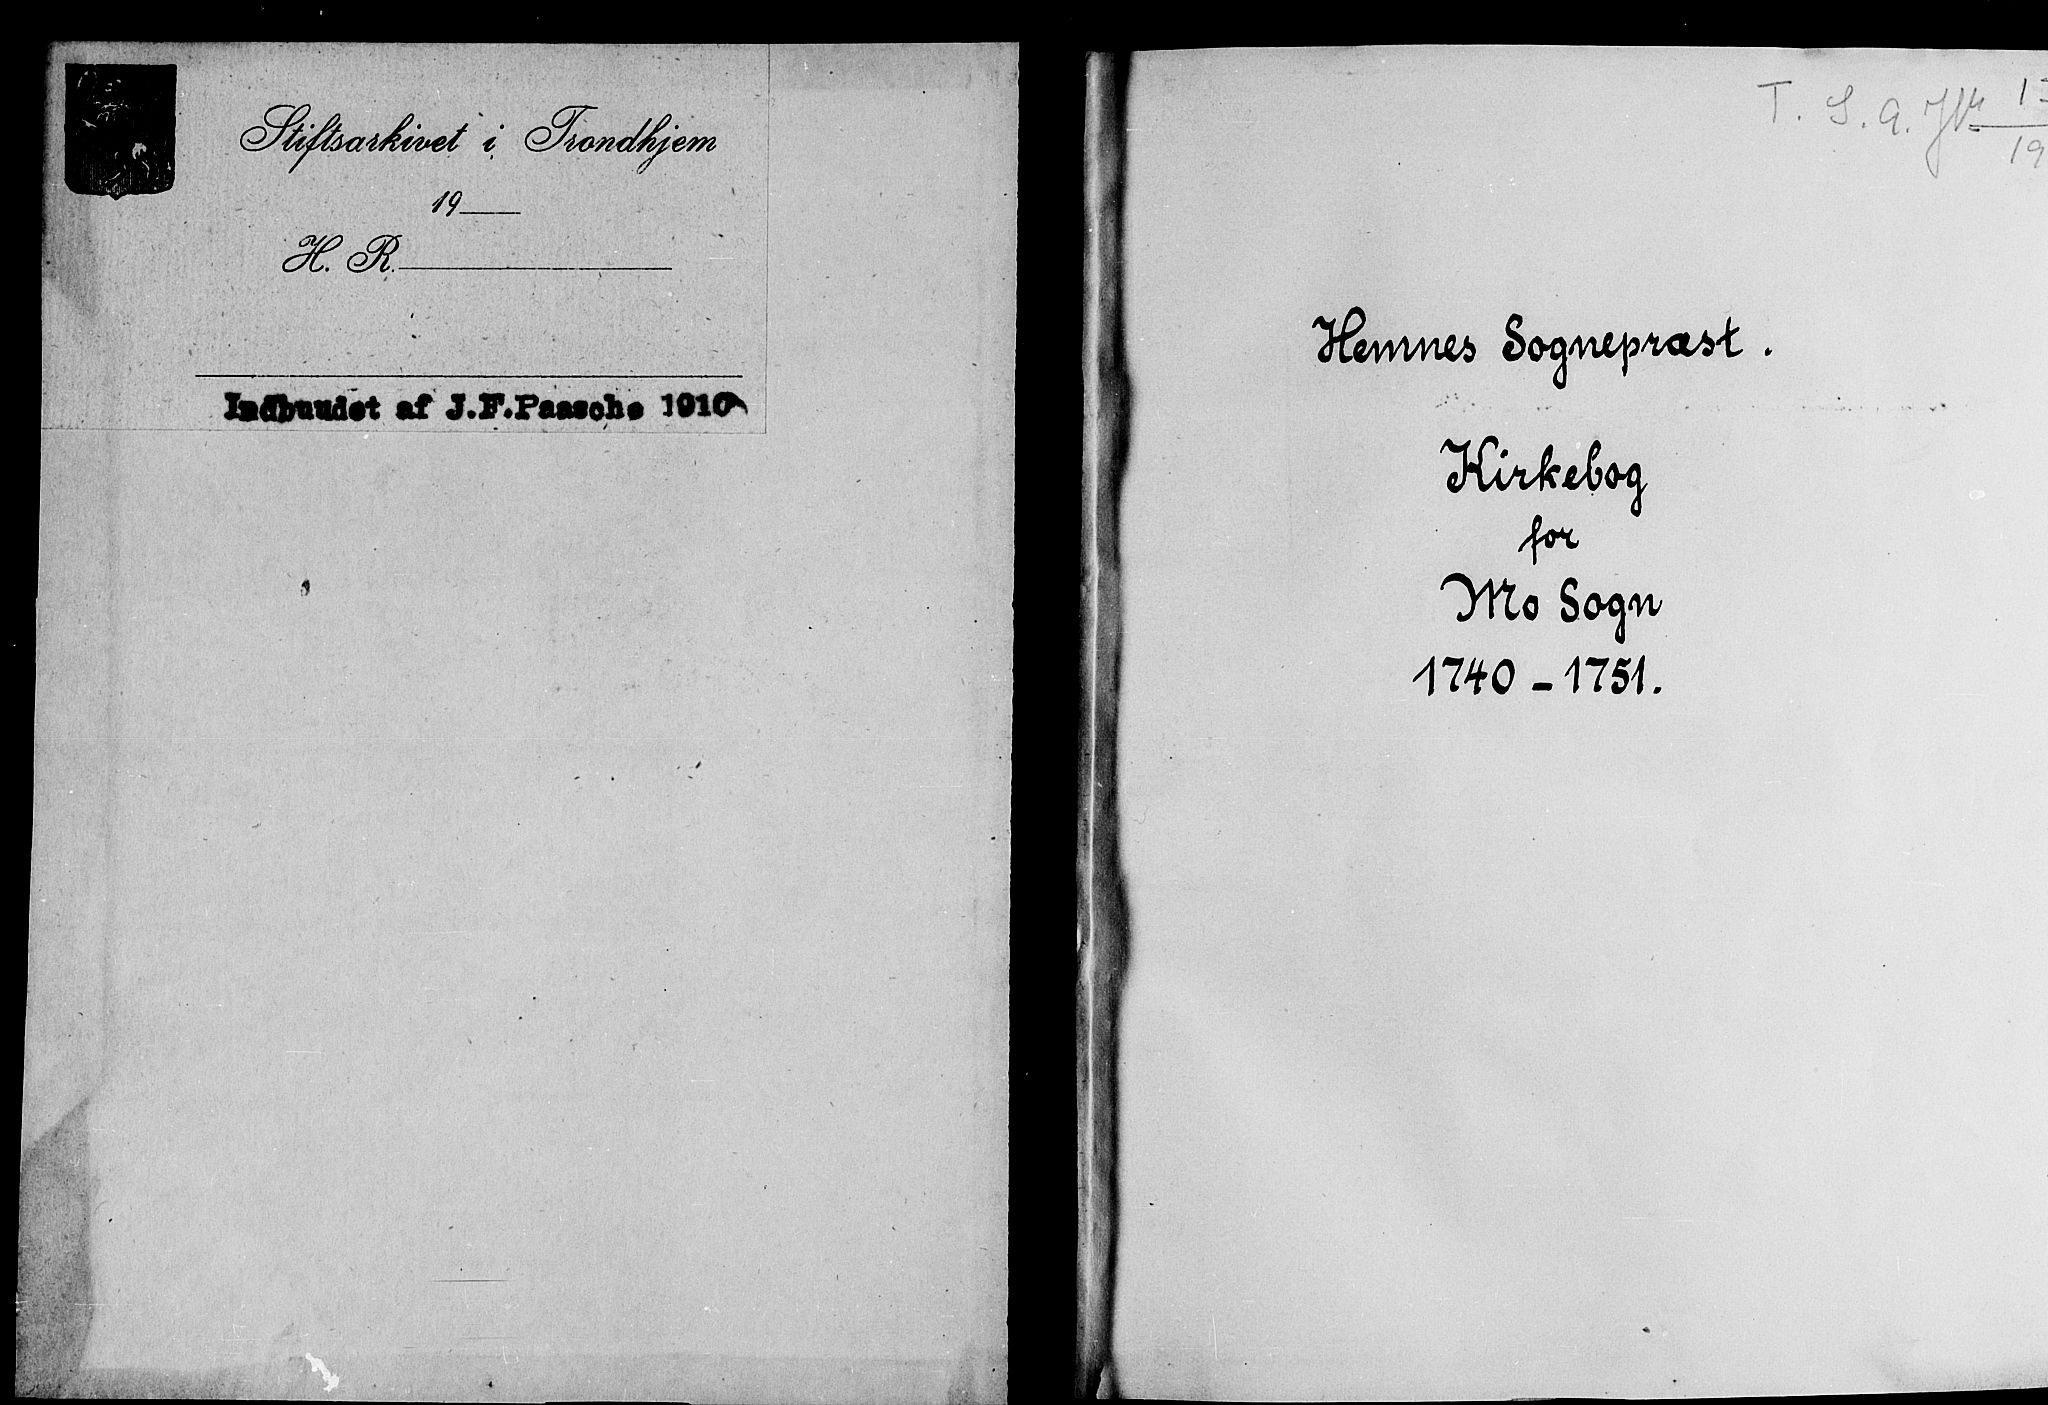 SAT, Ministerialprotokoller, klokkerbøker og fødselsregistre - Nordland, 827/L0389: Ministerialbok nr. 827A01, 1740-1751